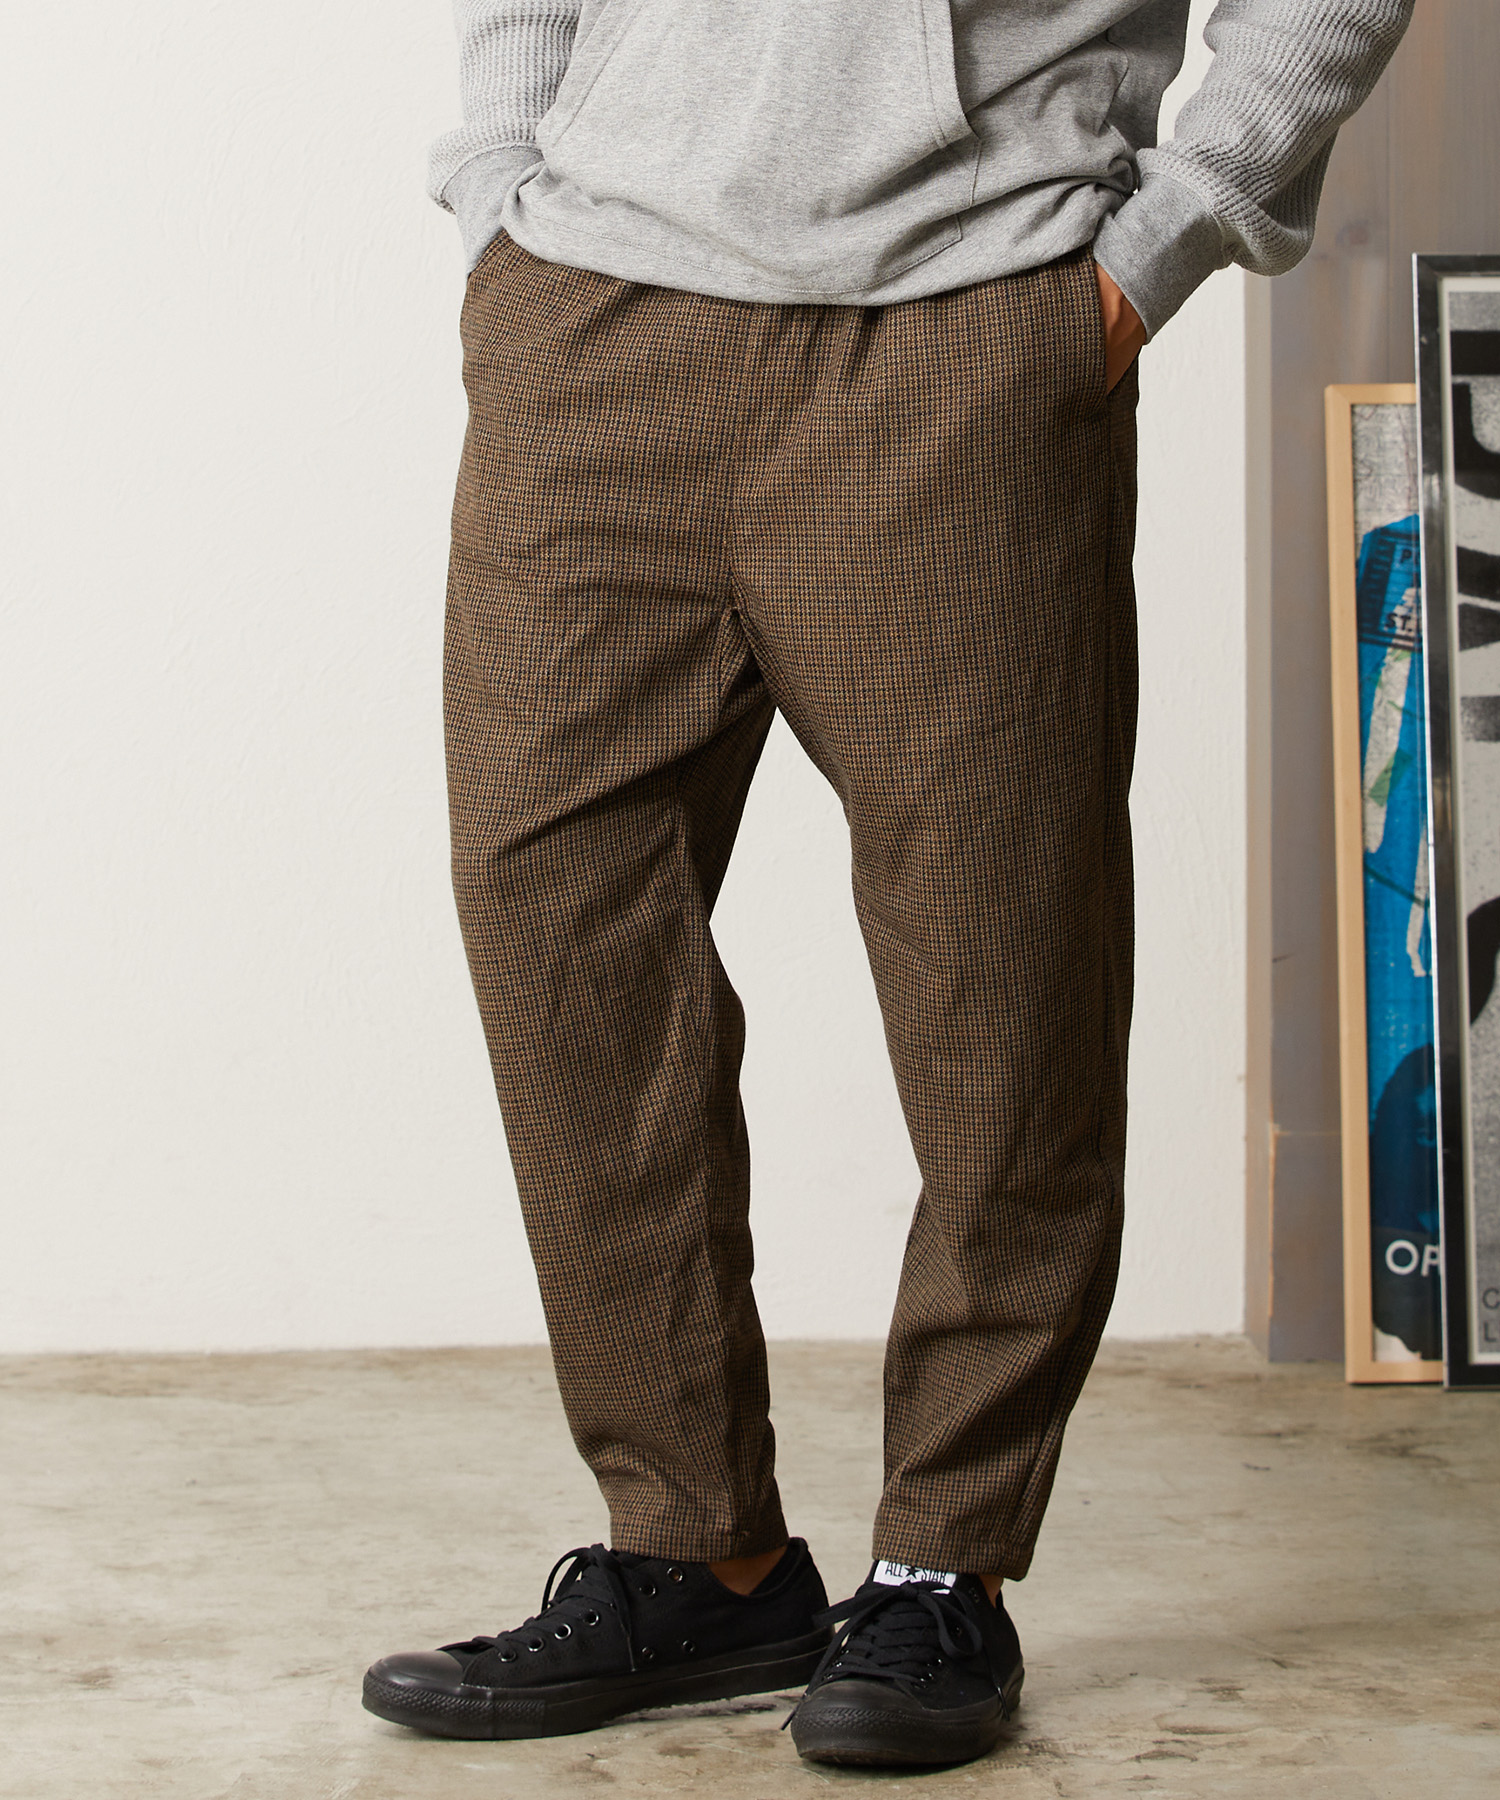 【CAMBIO(カンビオ)】【予約販売10月中旬~下旬入荷】Monotone Gun Club Check Sarrouel Tight Tapered Pants テーパードパンツ